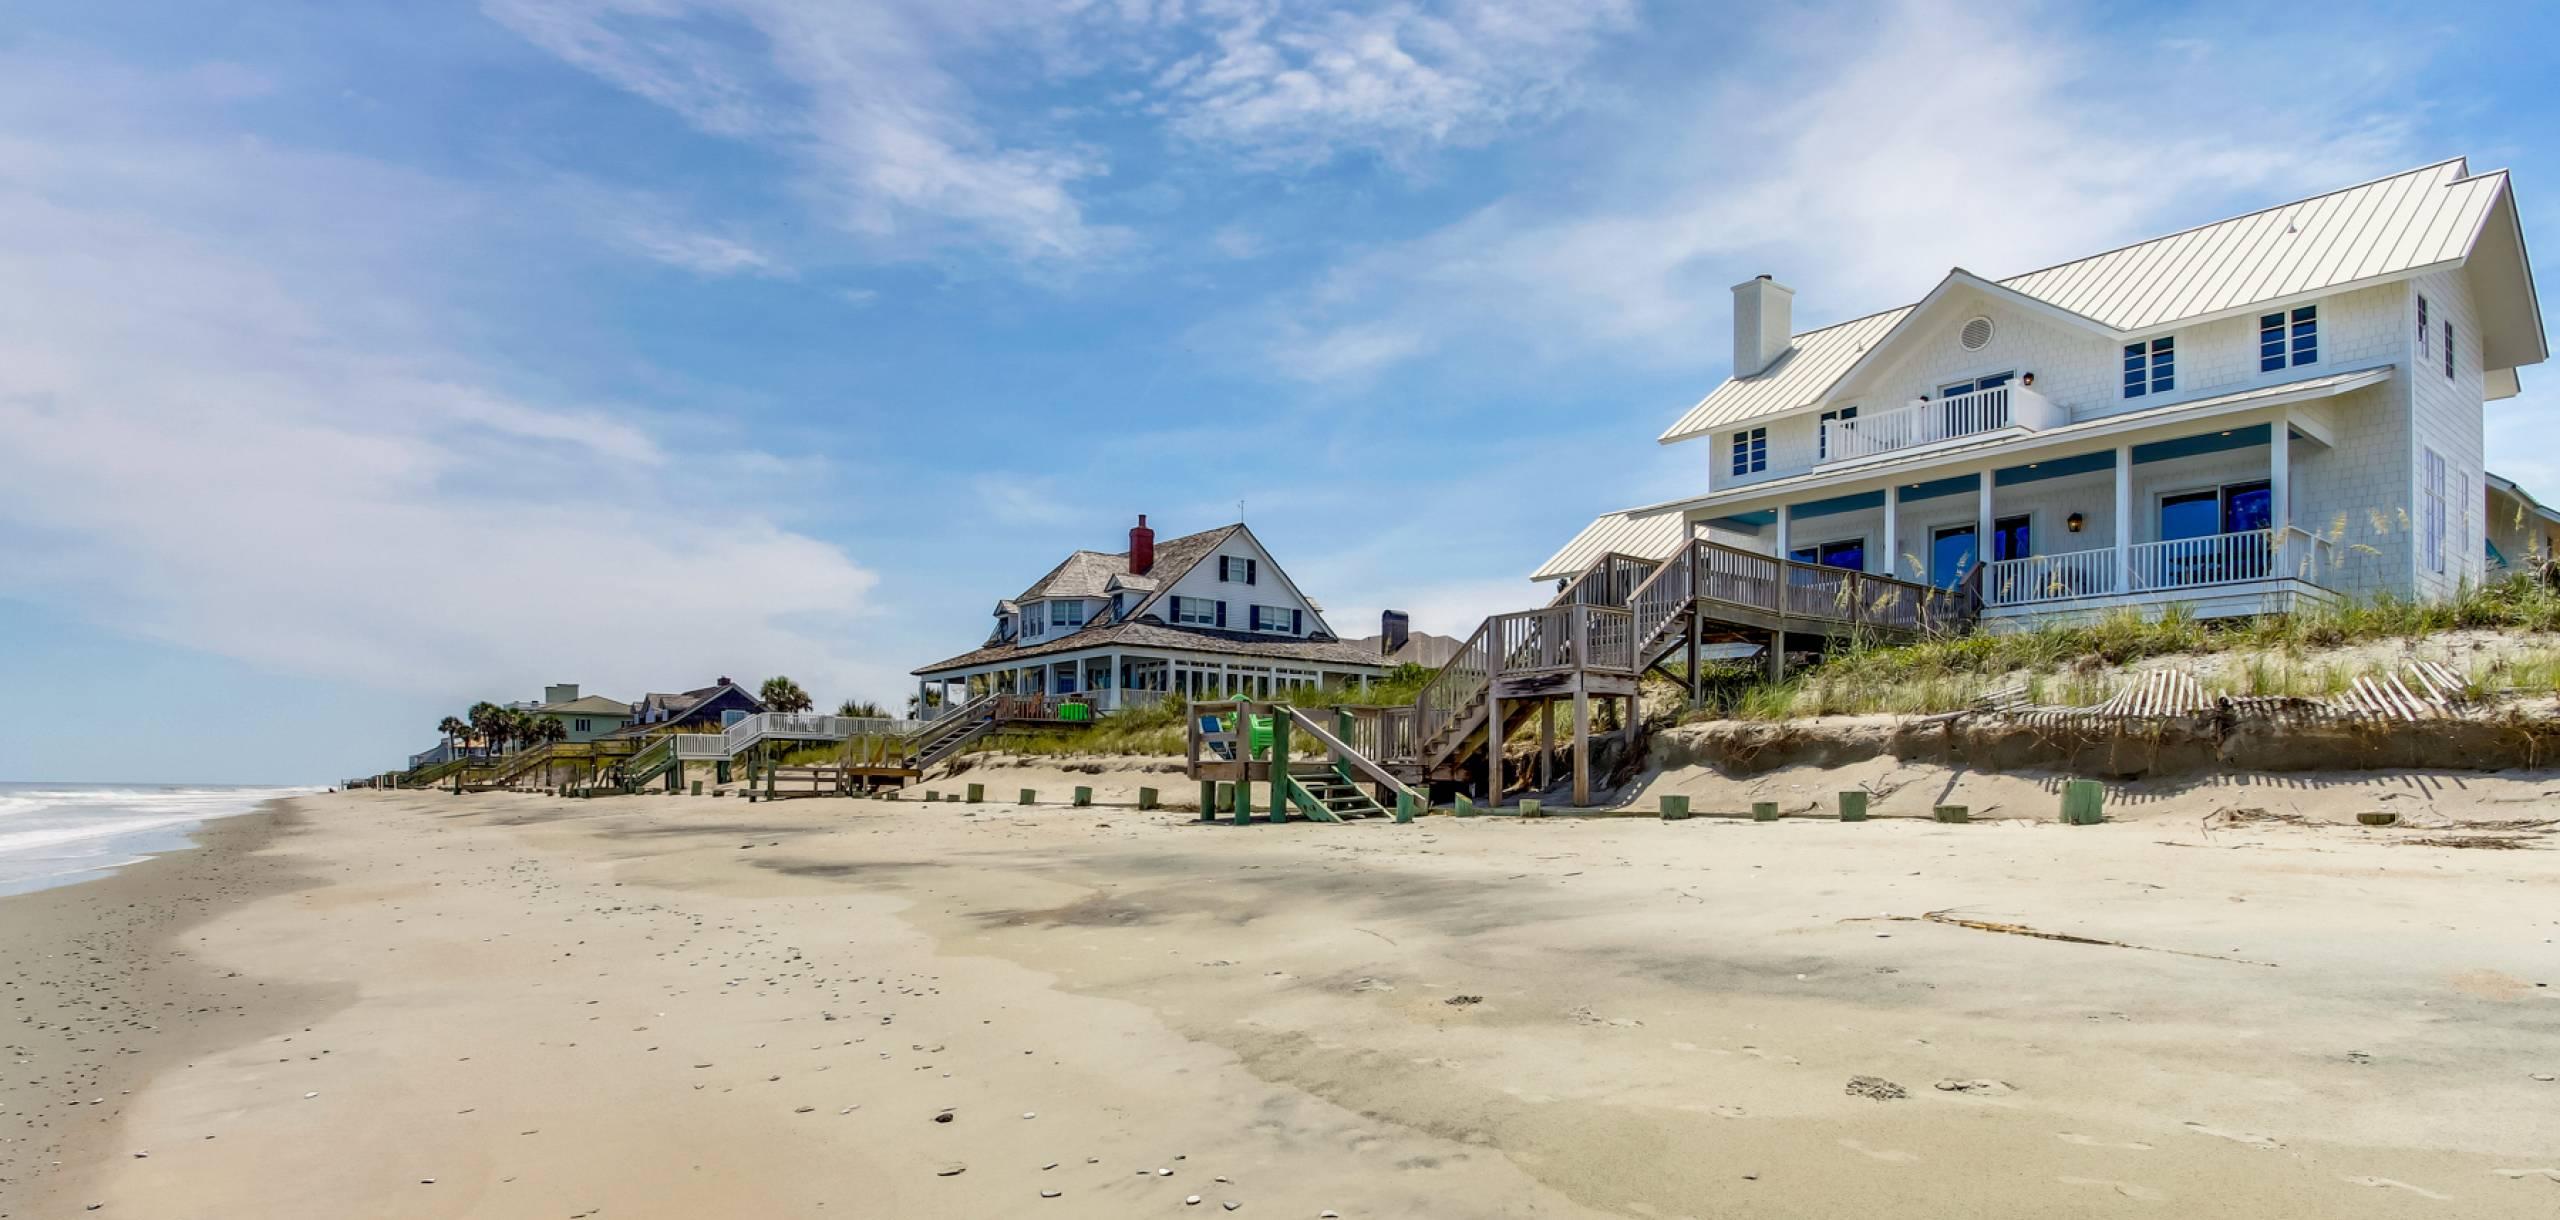 pawleys island beach house rentals